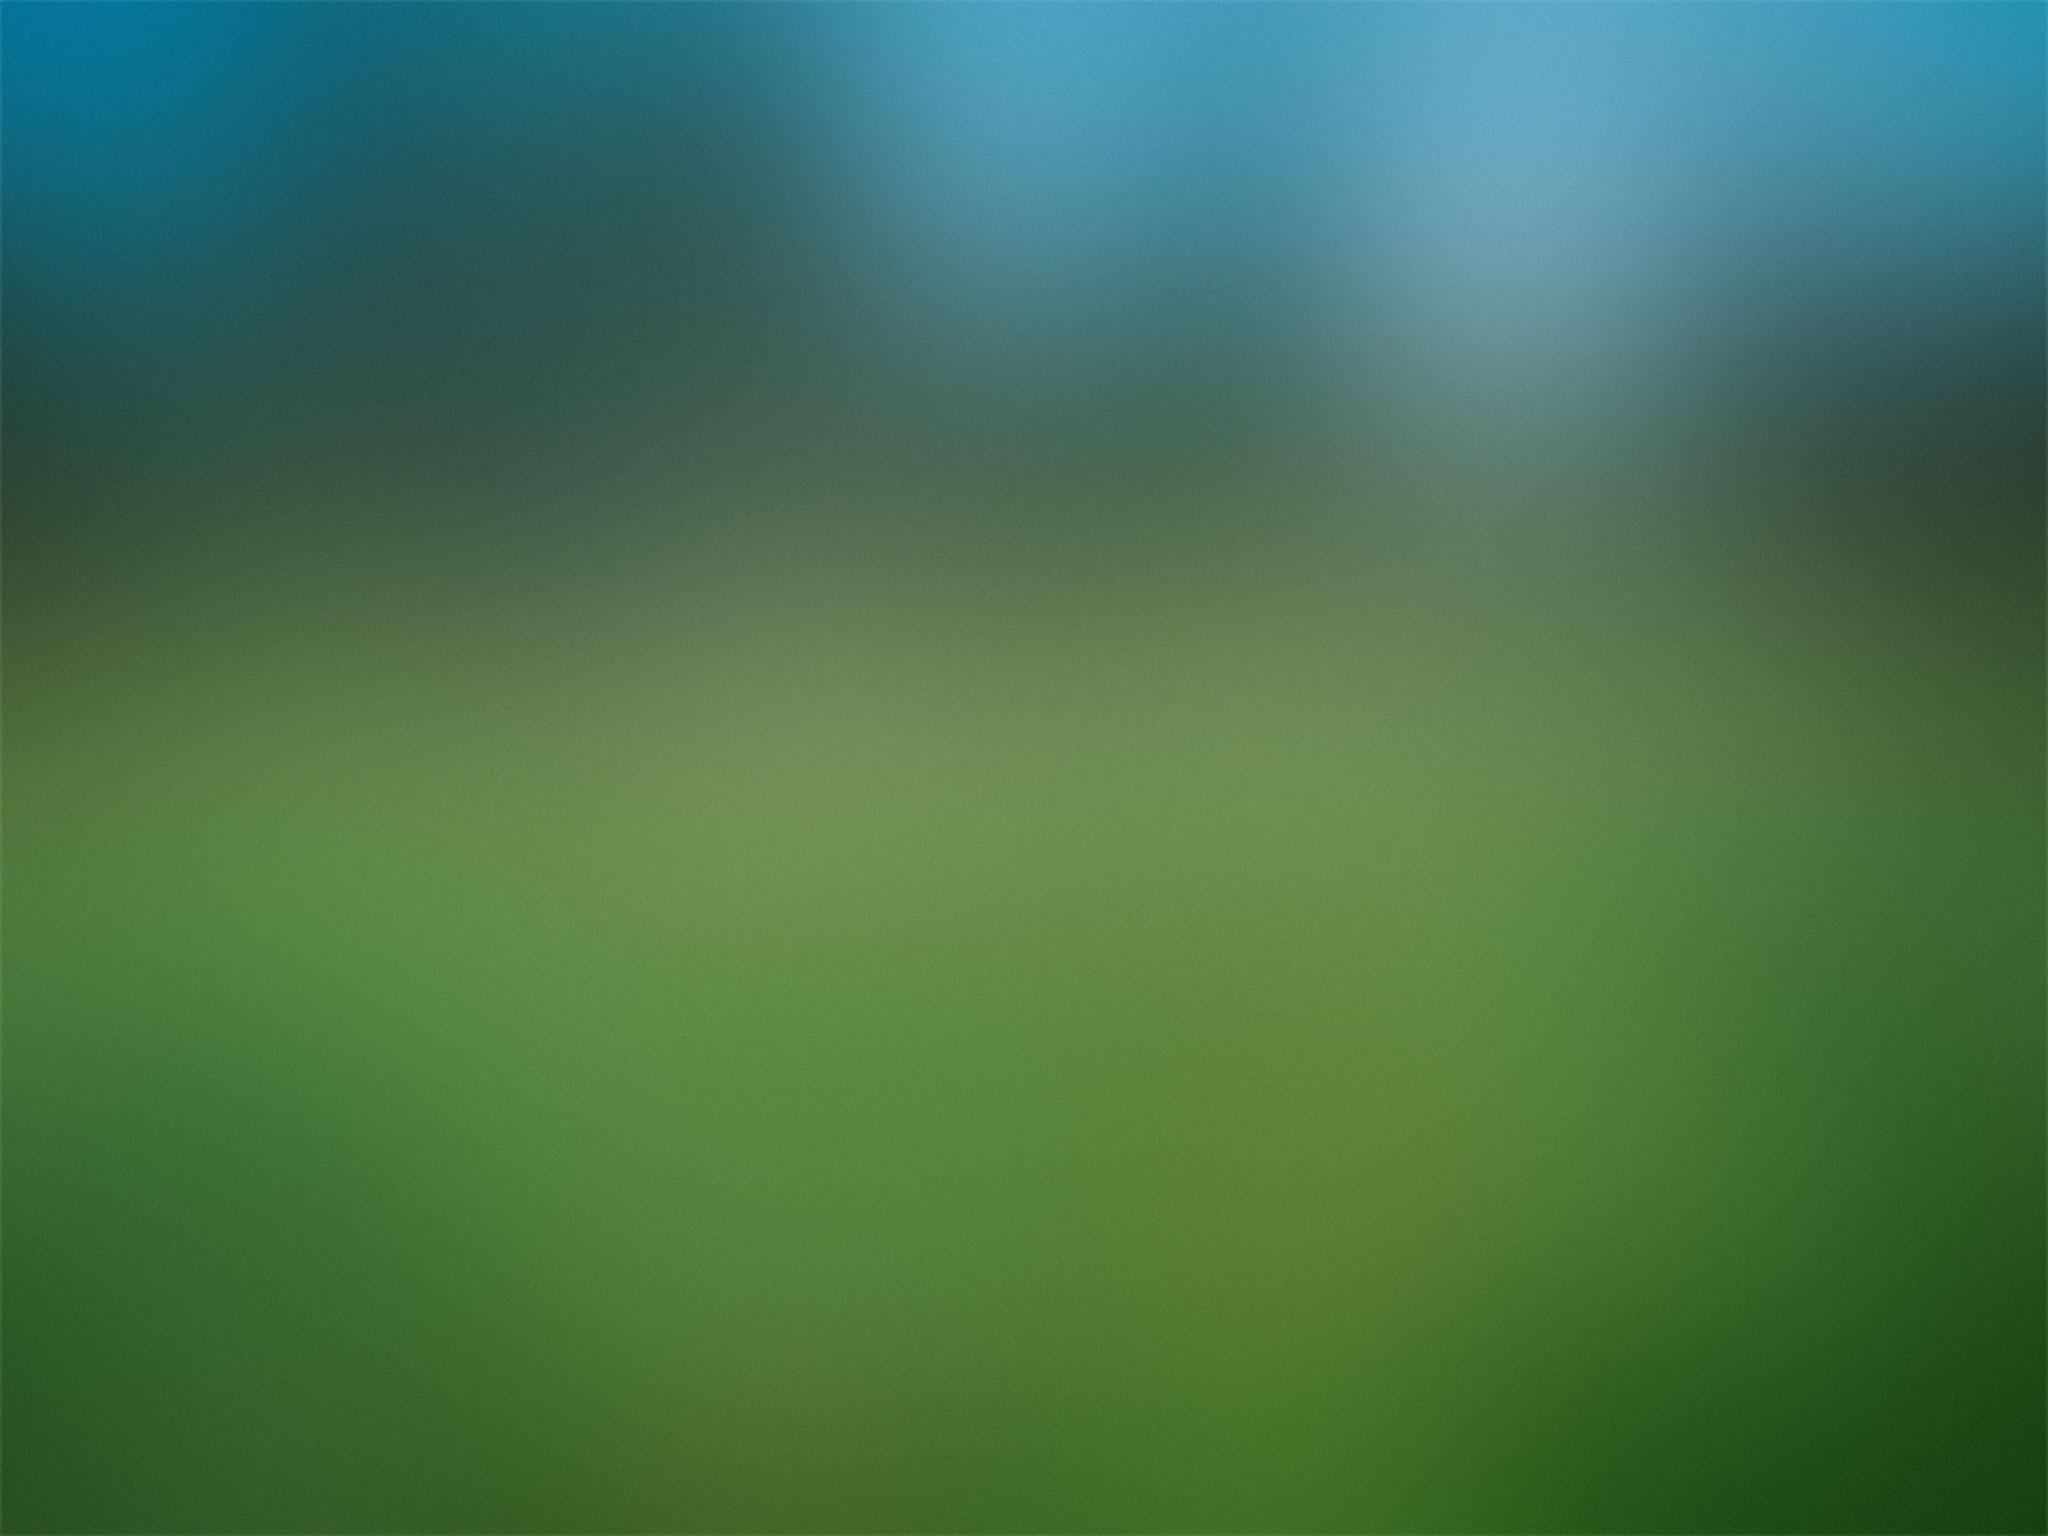 bg-blur-4